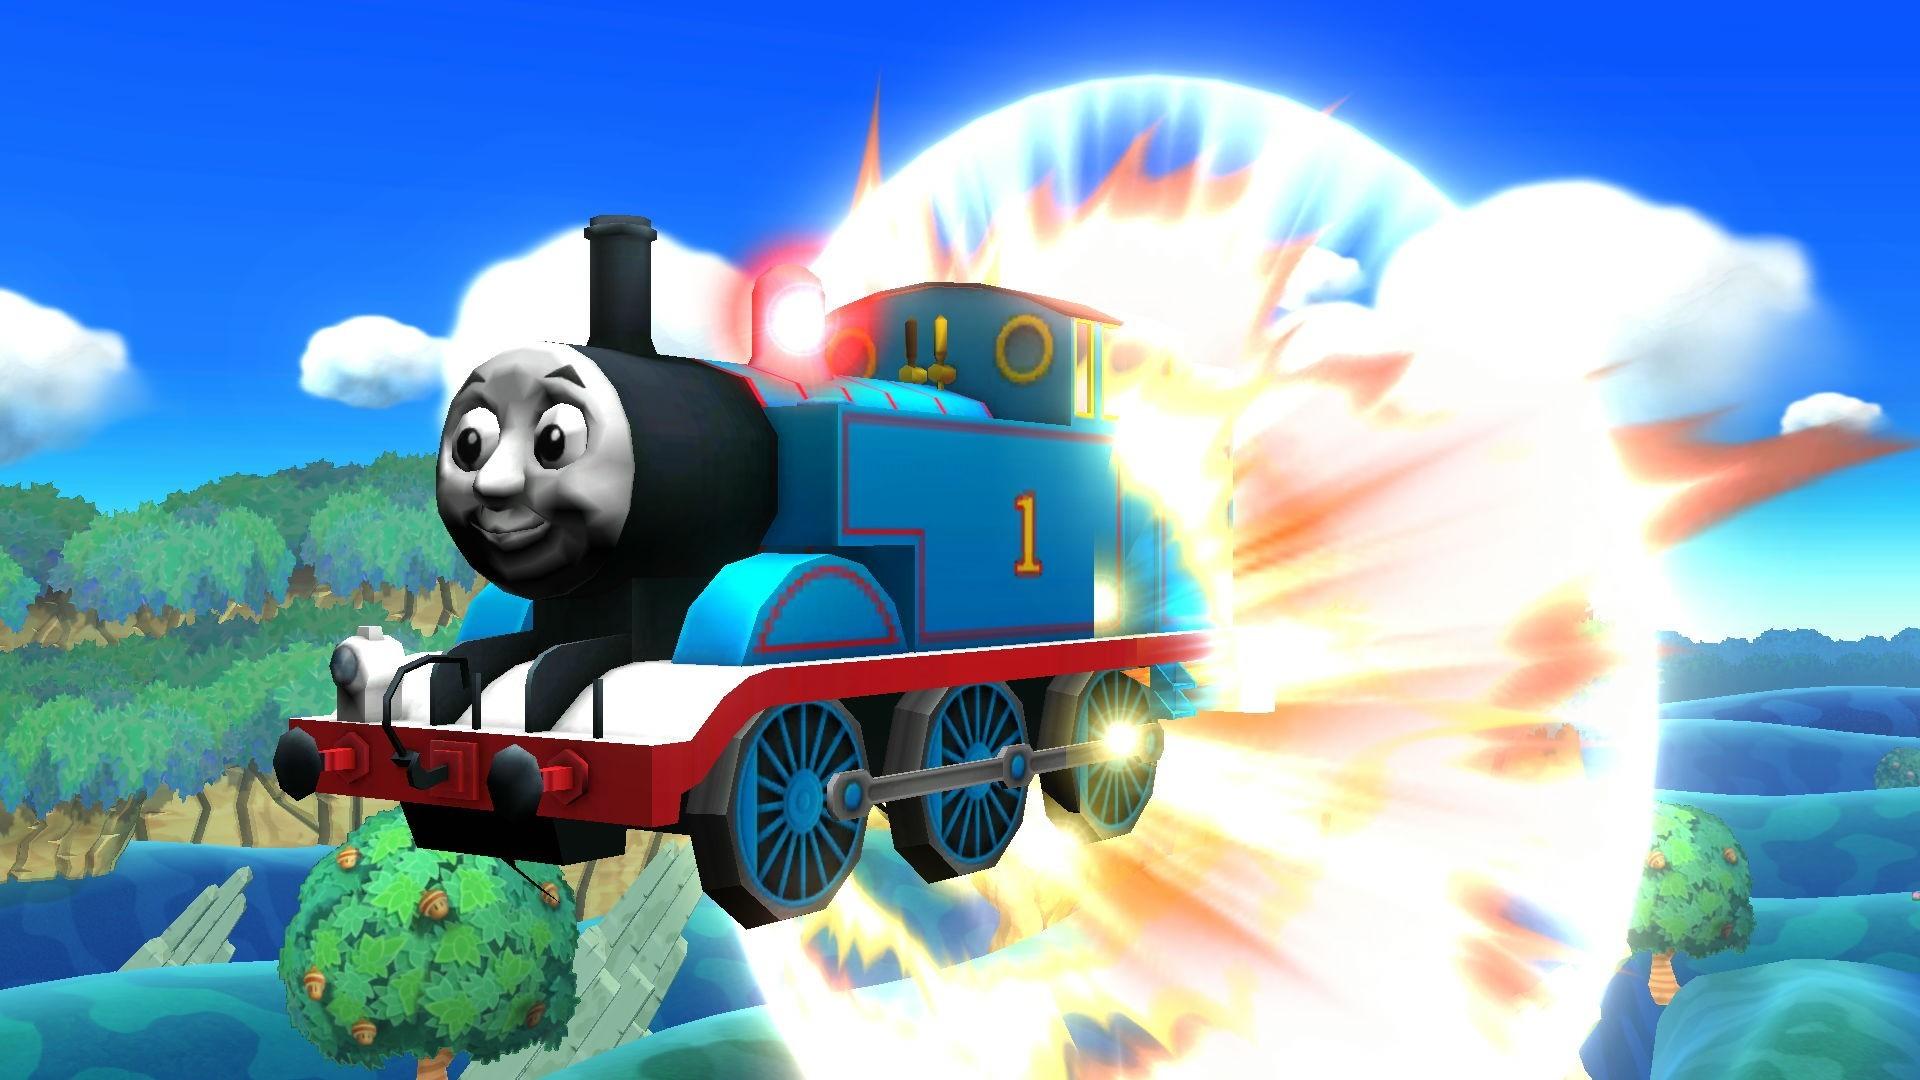 Thomas The Train Desktop Wallpaper 78 Images